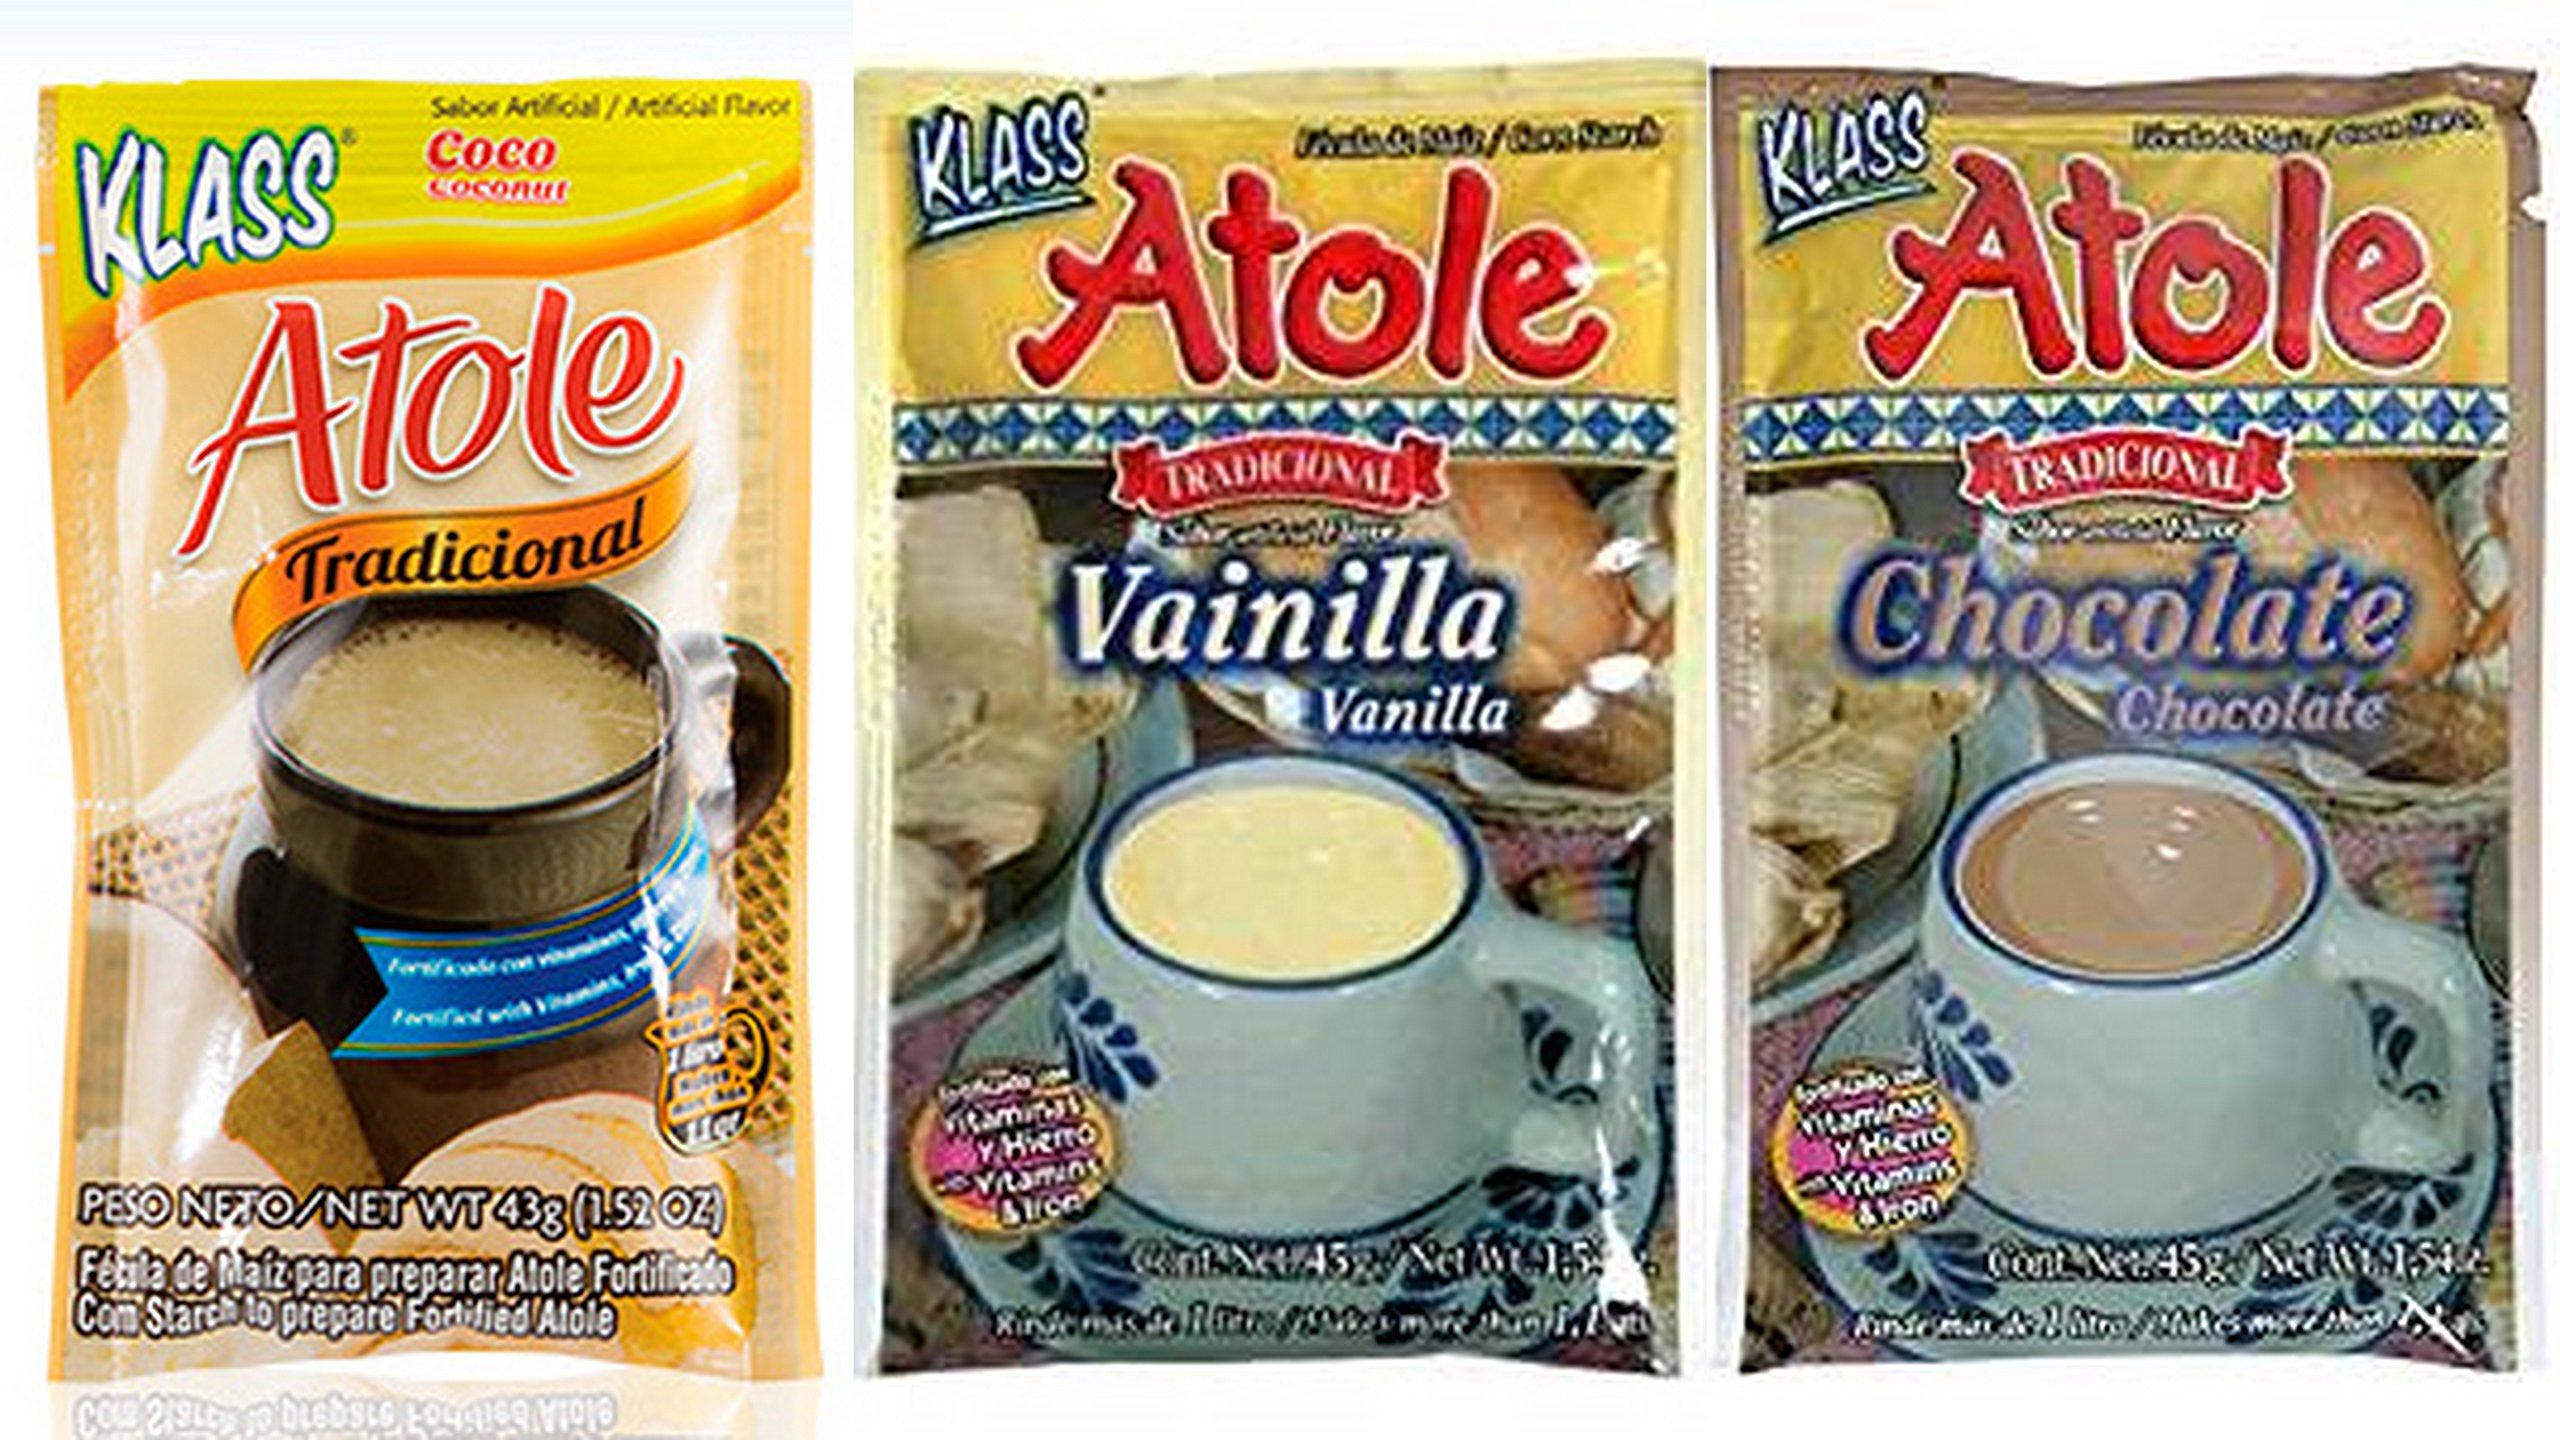 Klass Atole Variety Bundle, 1.52 oz (Pack of 9) includes 3-Pkt Chocolate + 3-Pkt Vanilla + 3-Pkt Coconut